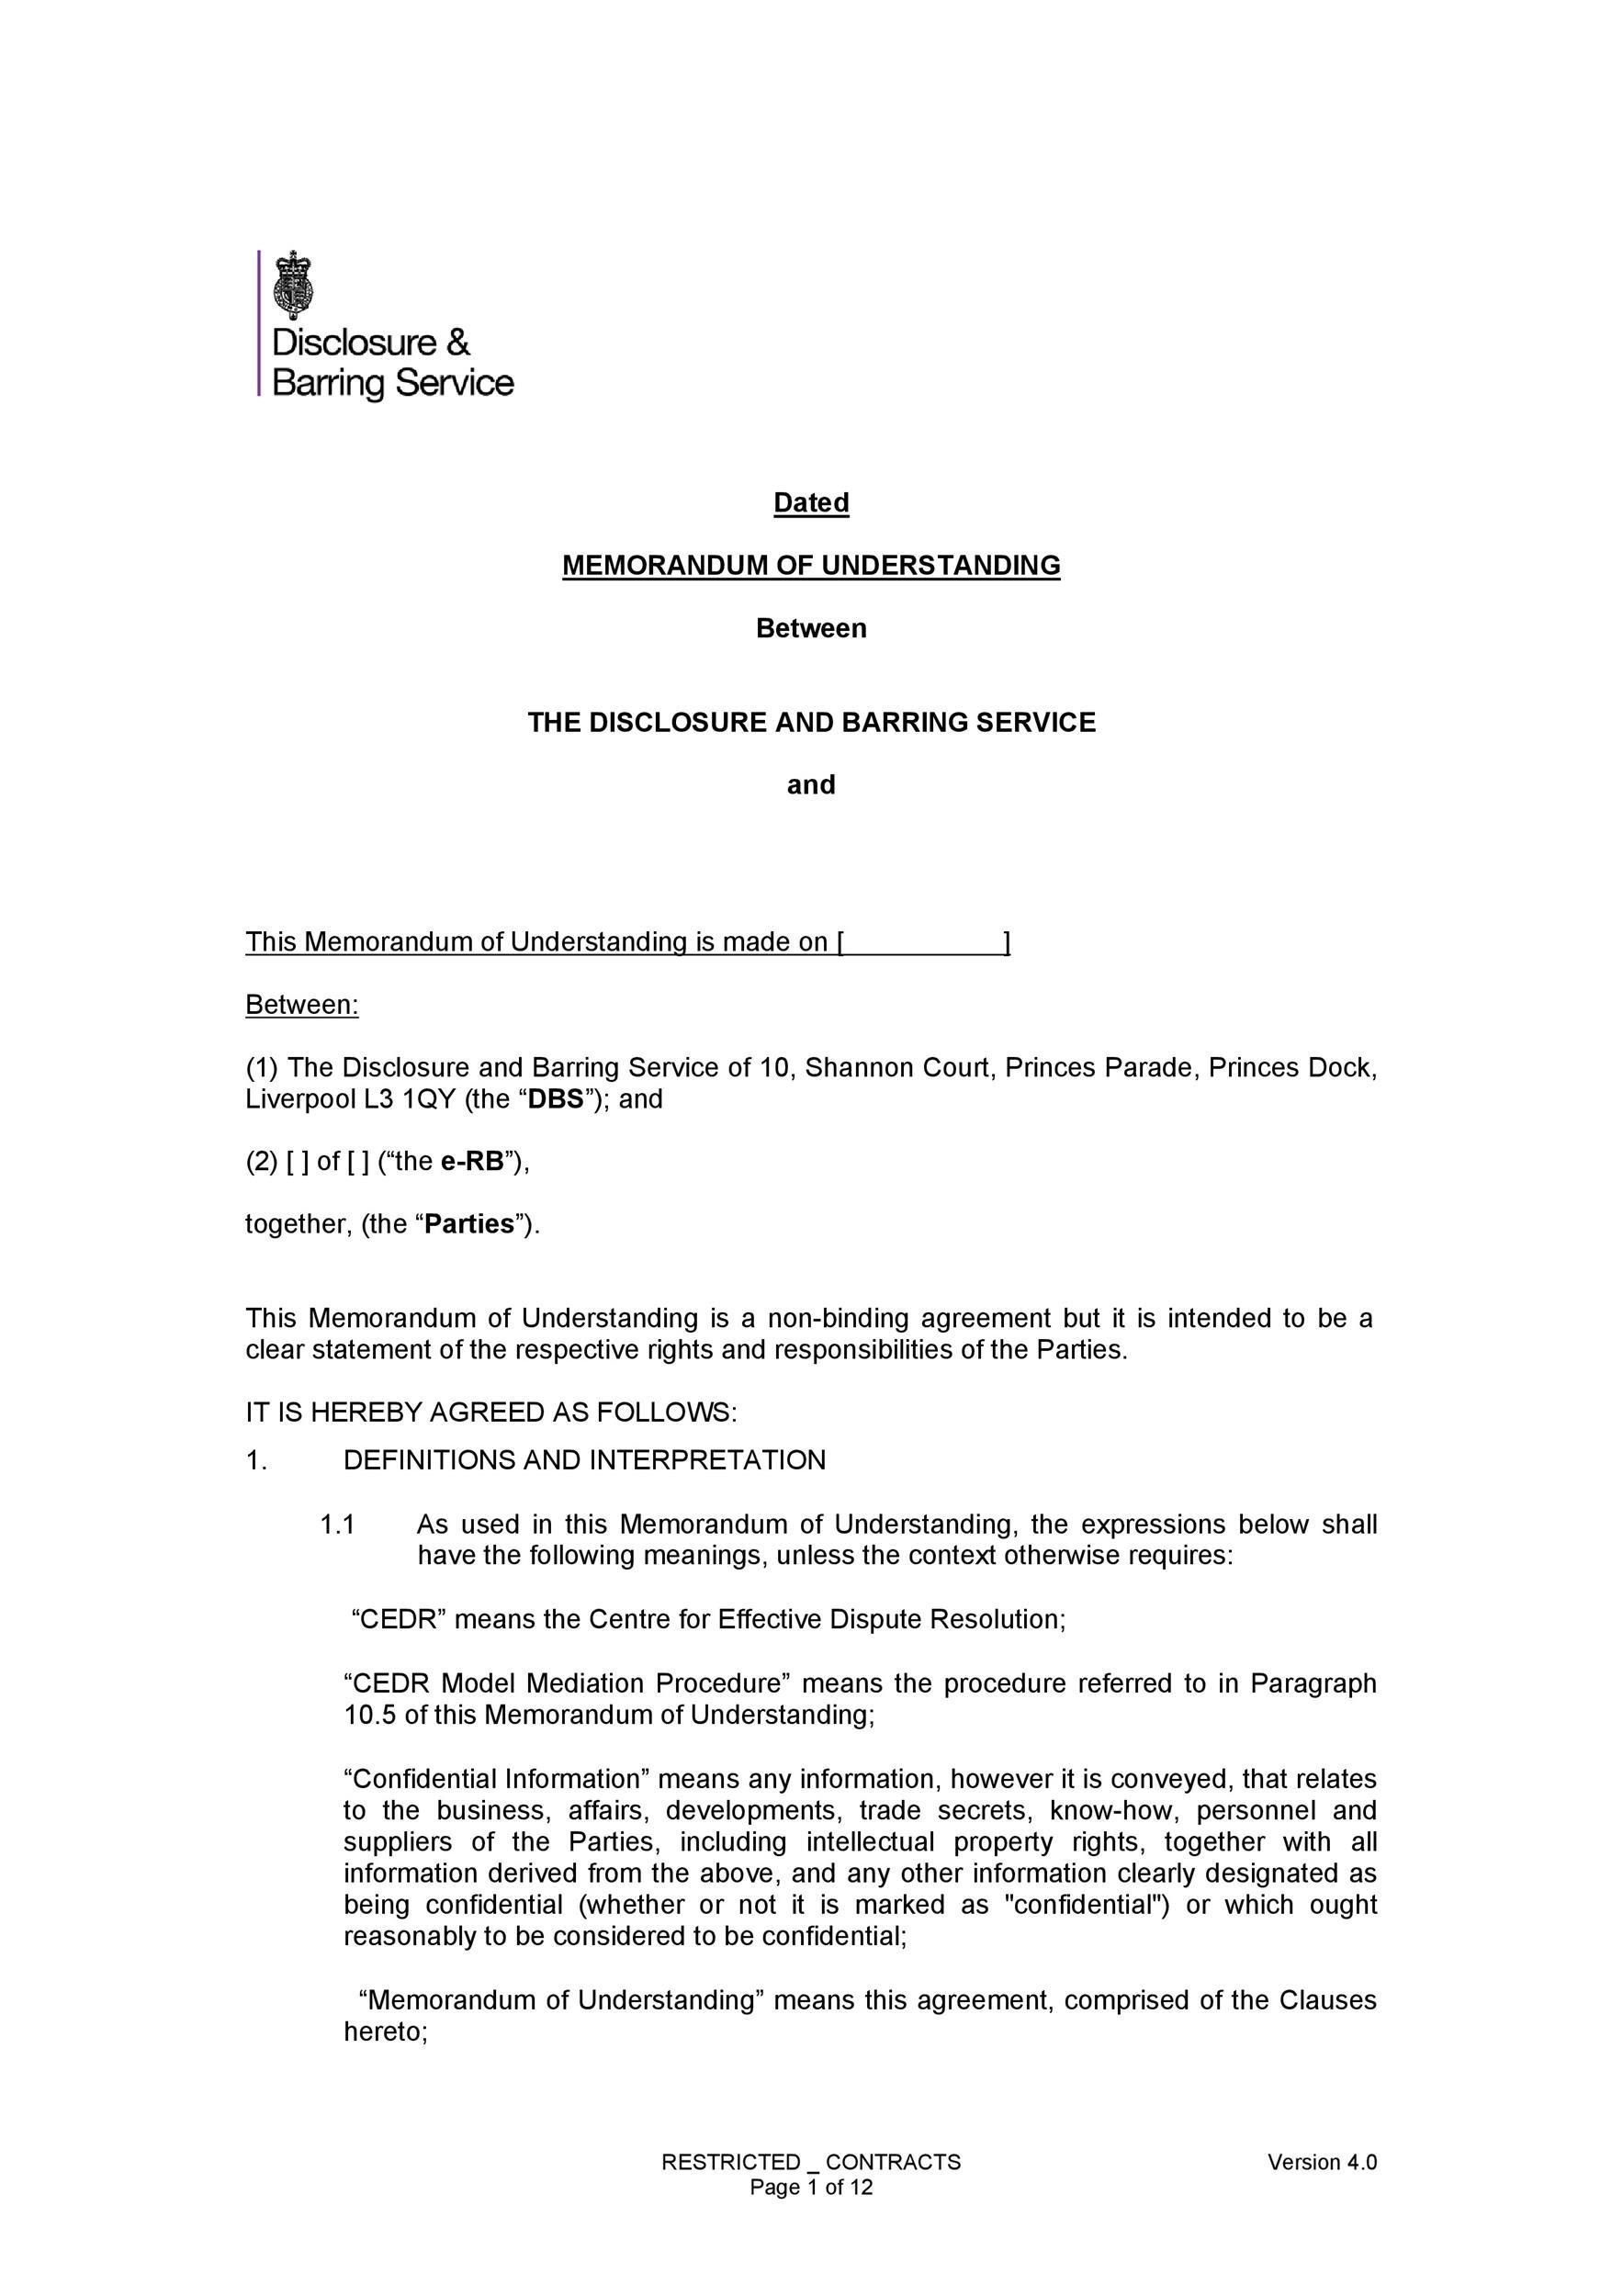 Free Memorandum of Understanding Template 23